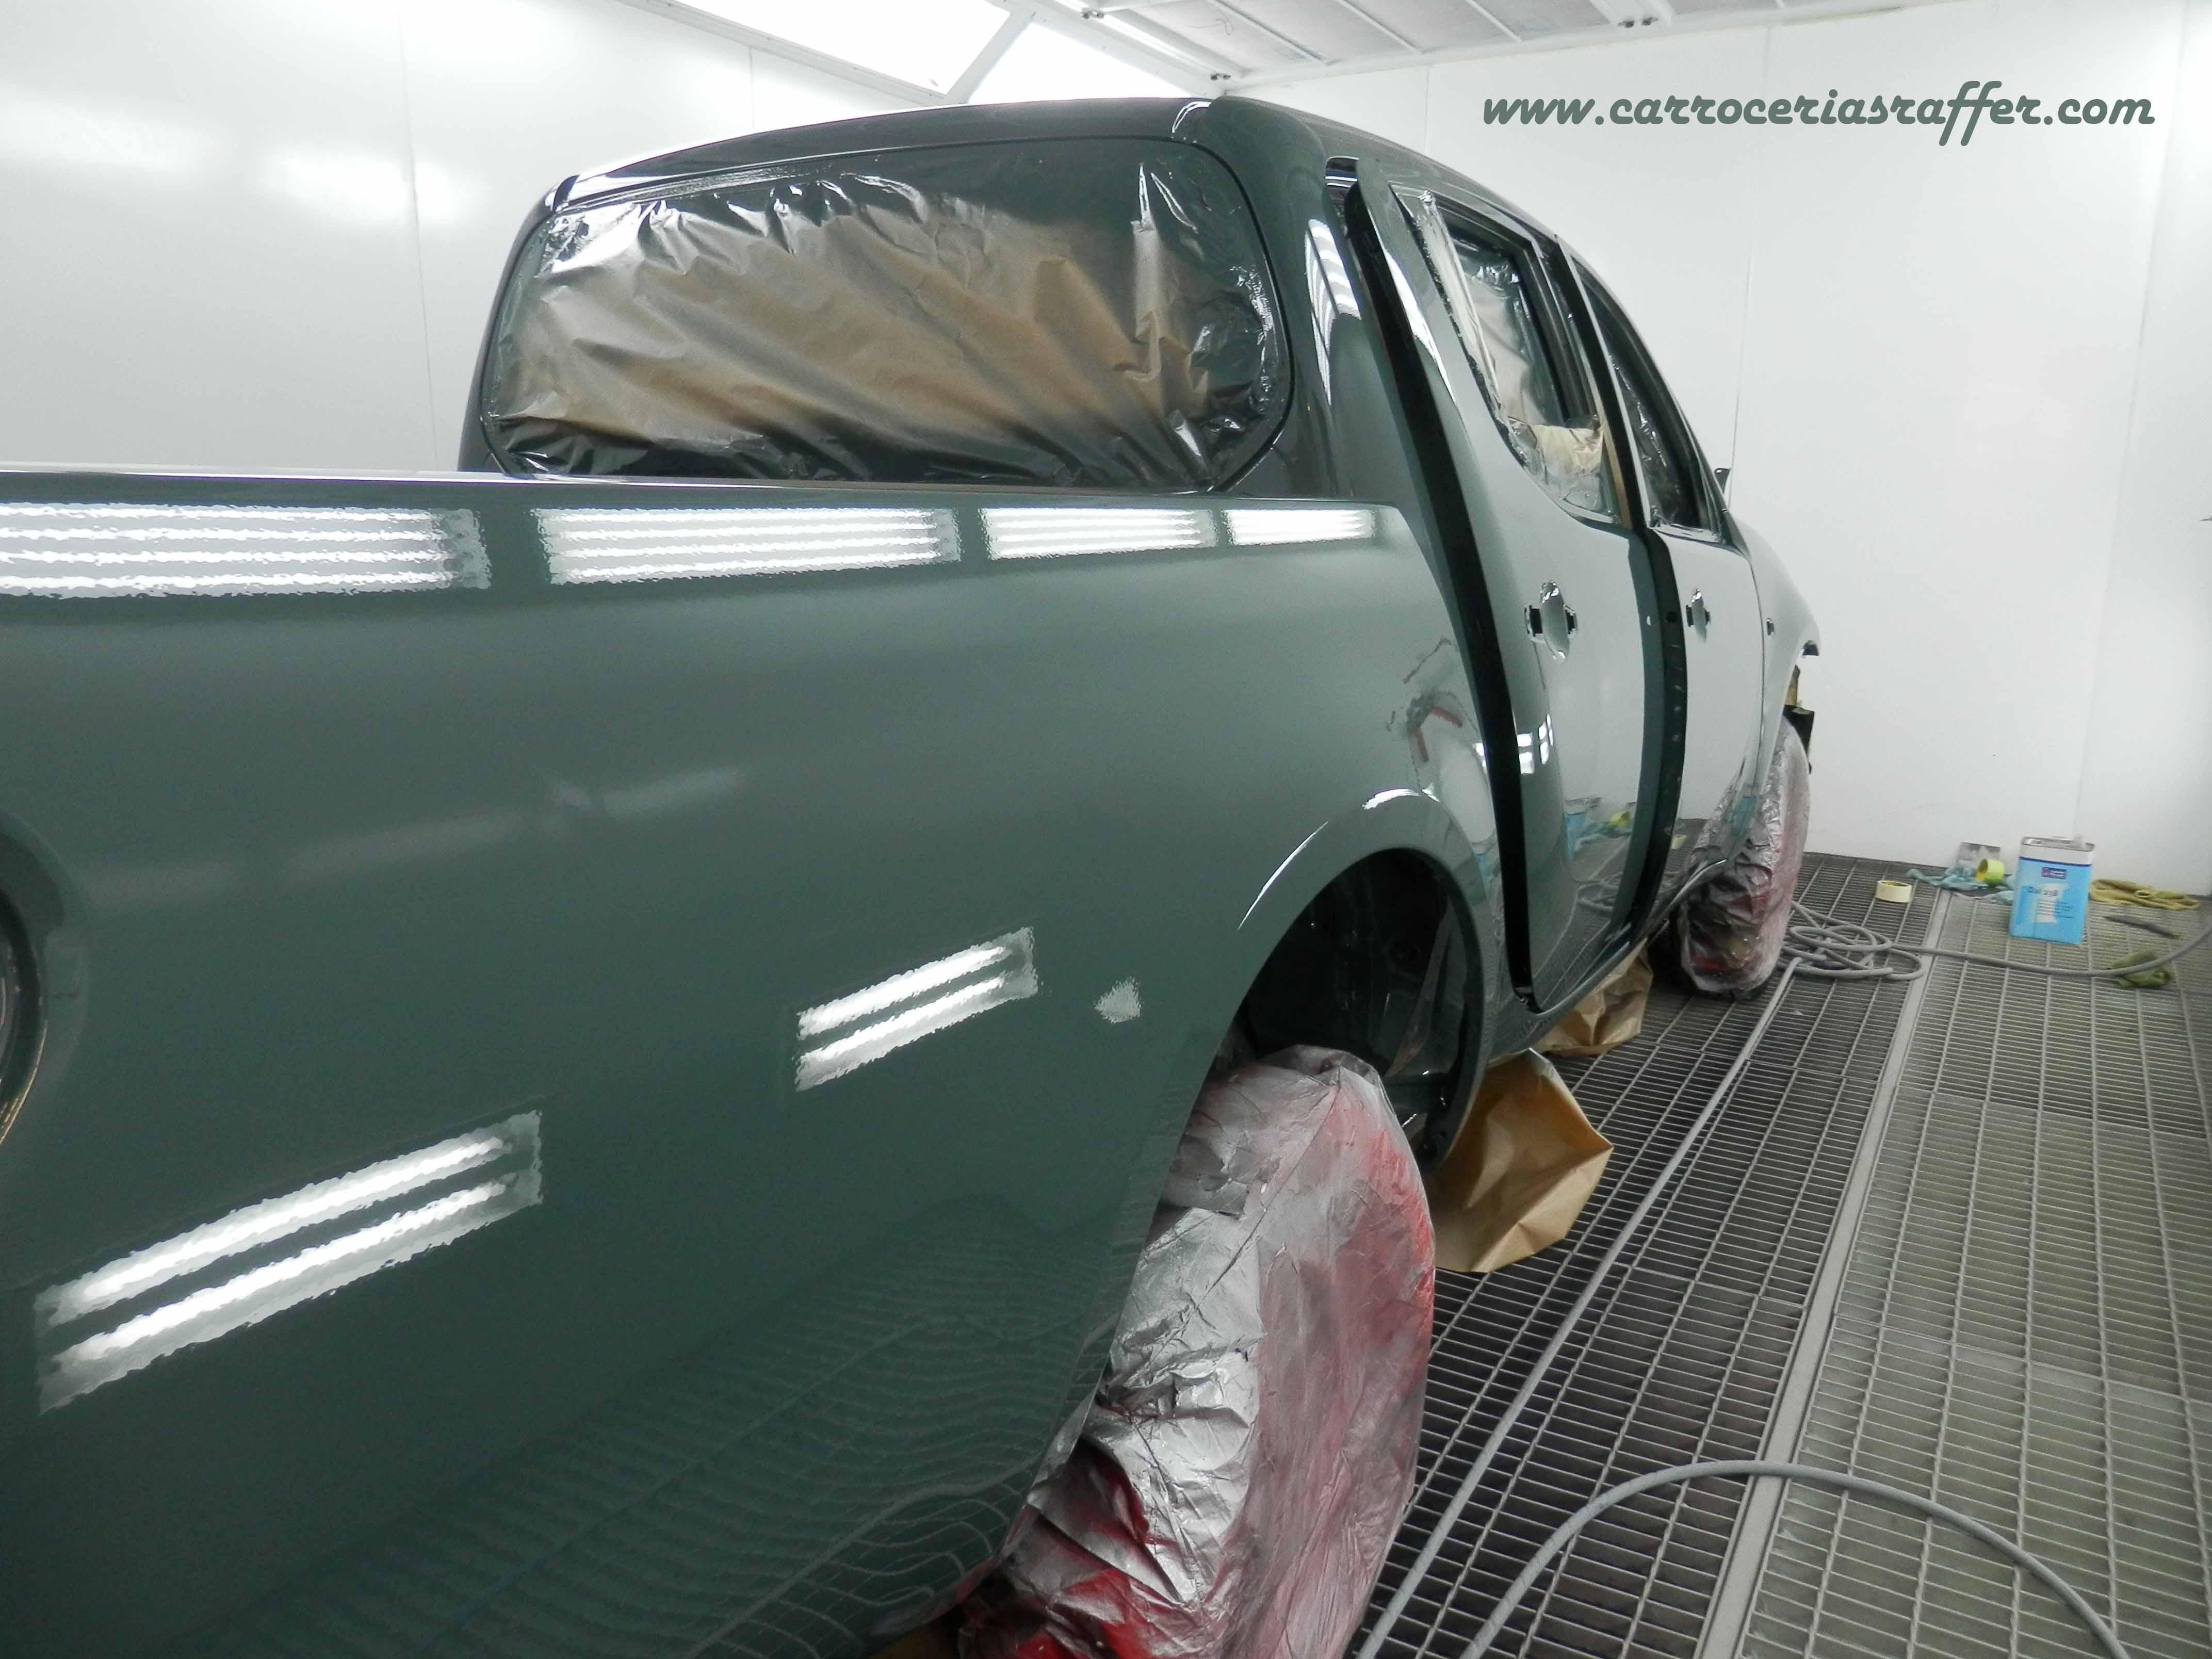 Entra en cabina este Mitsubishi L200, un Pick-Up que pintamos entero.